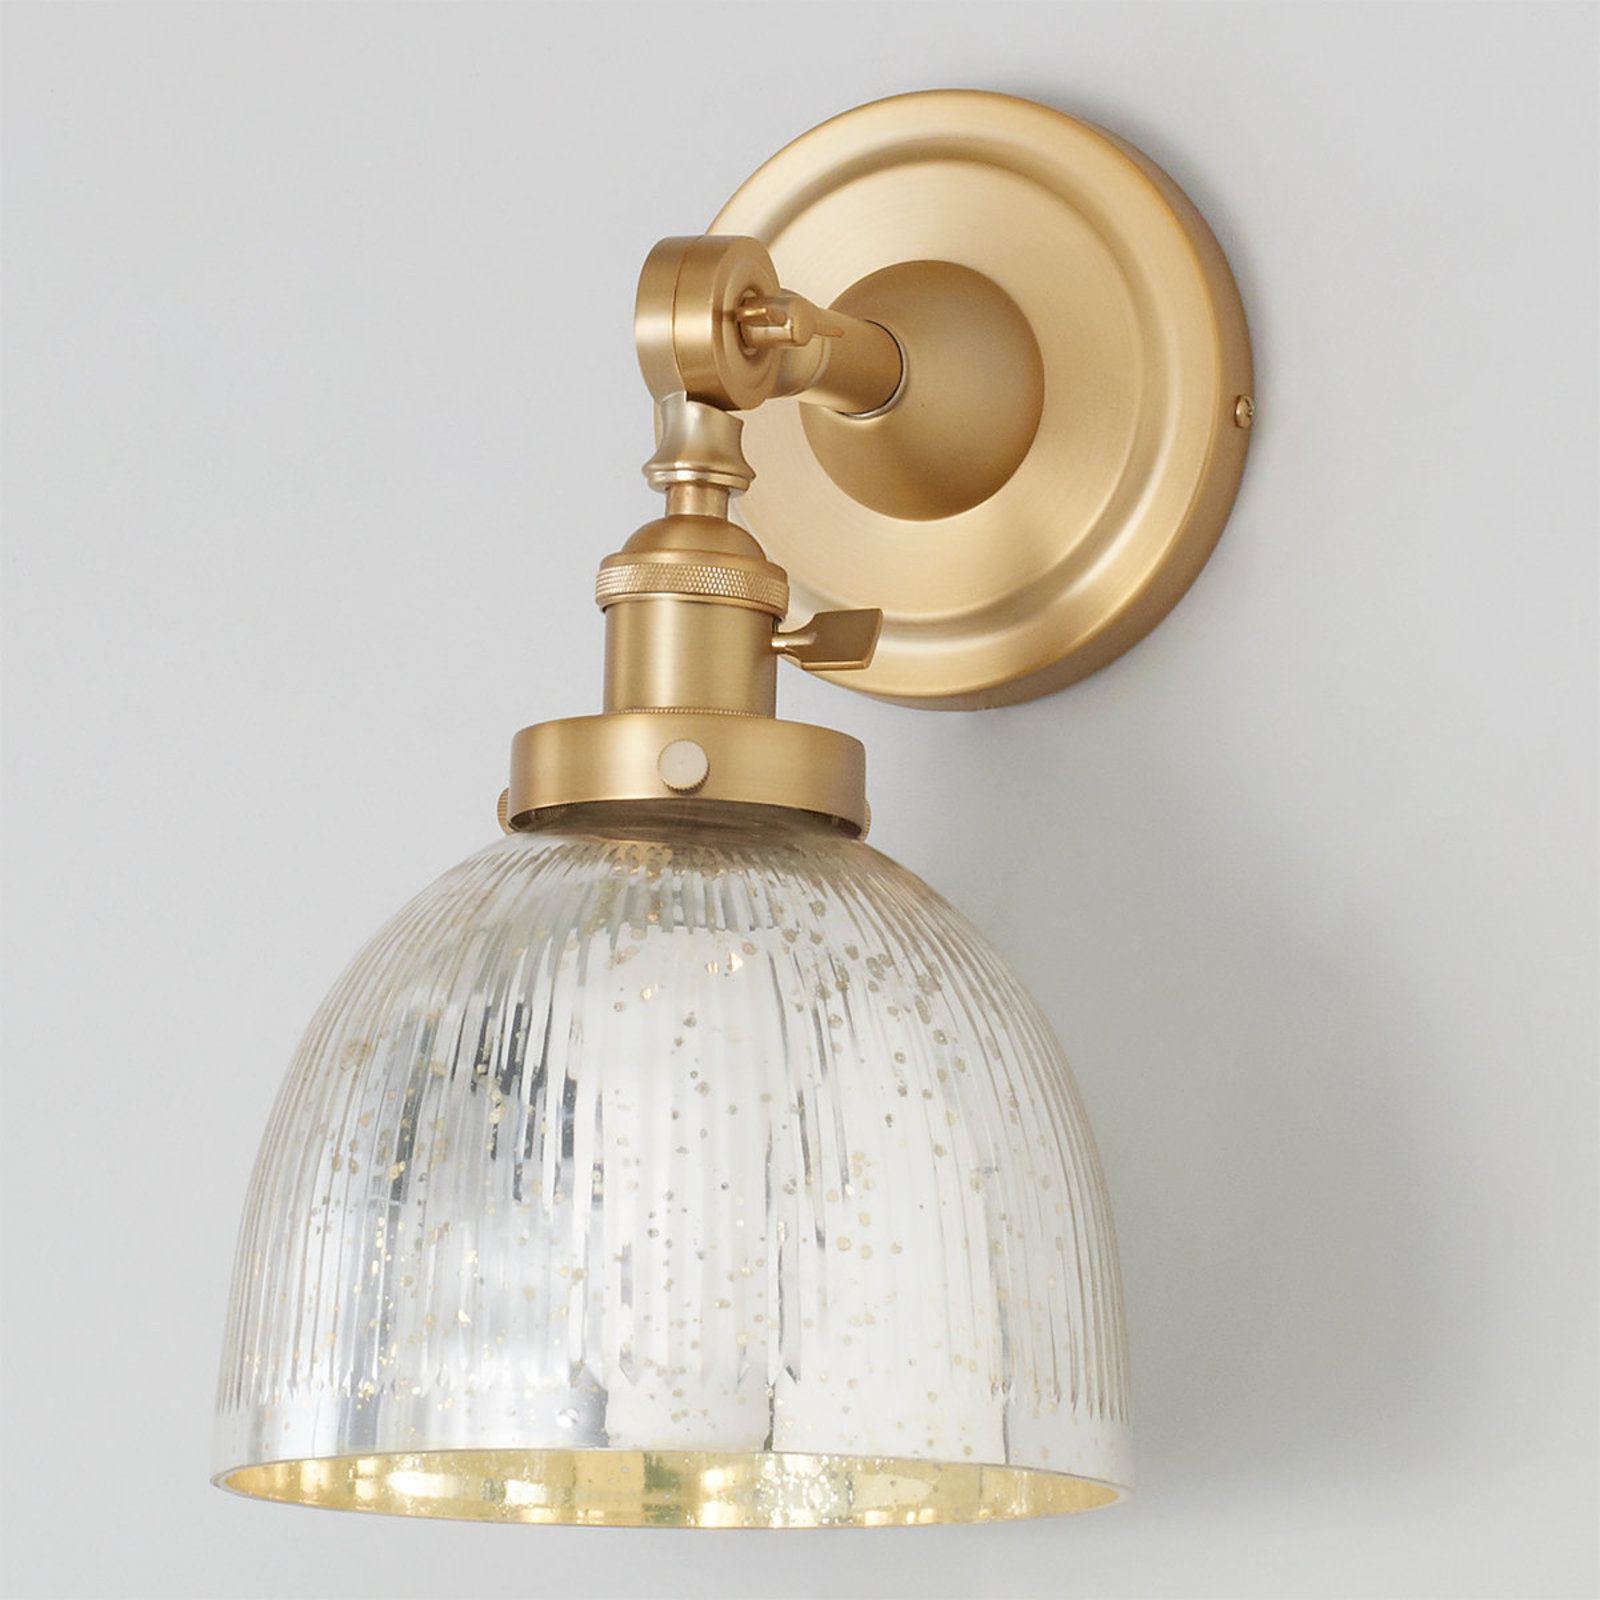 Mercury Glass Dome Single Swivel Sconce Sconces Glass Ceiling